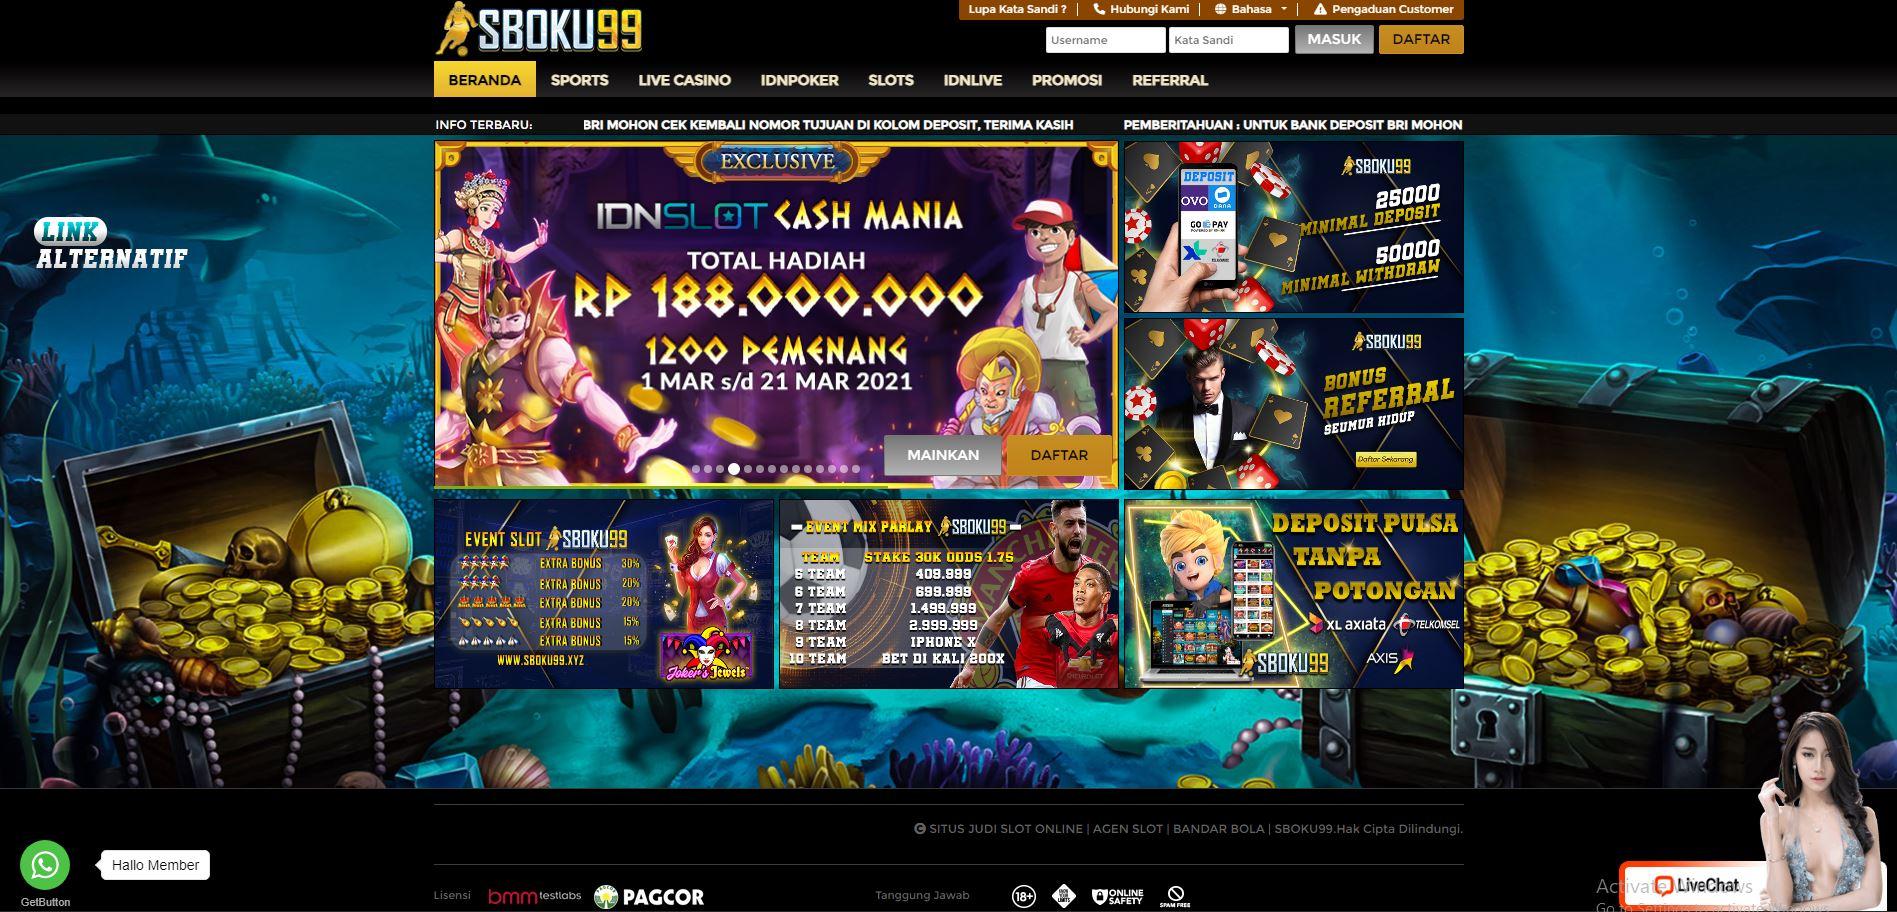 sbobet - sbobet 88 online indonesia sboku99